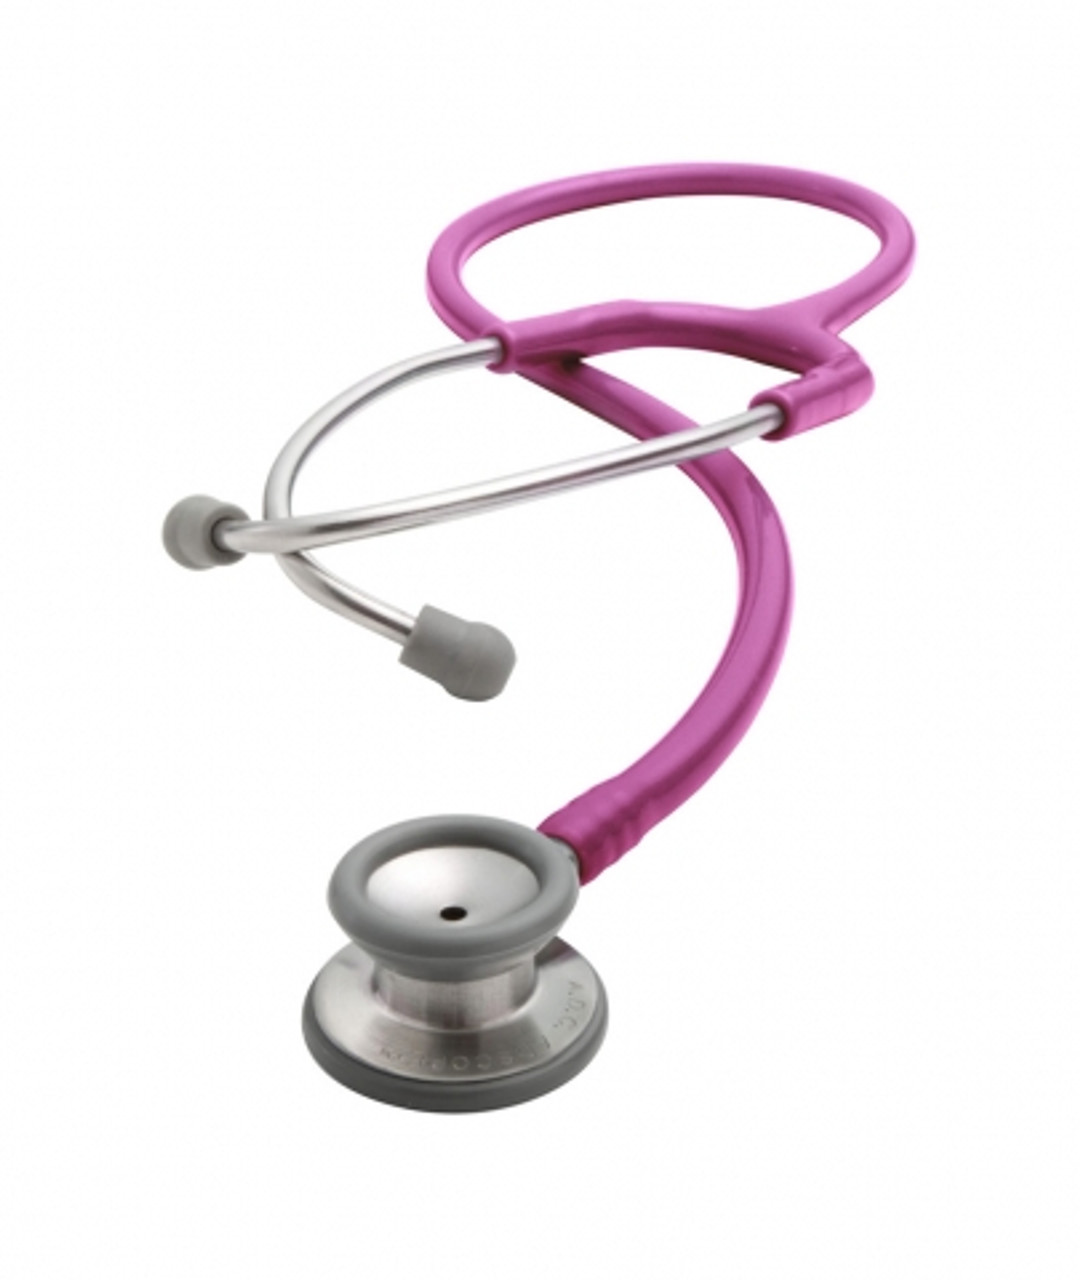 Adscope™ 604 Pediatric Clinician Stethoscope